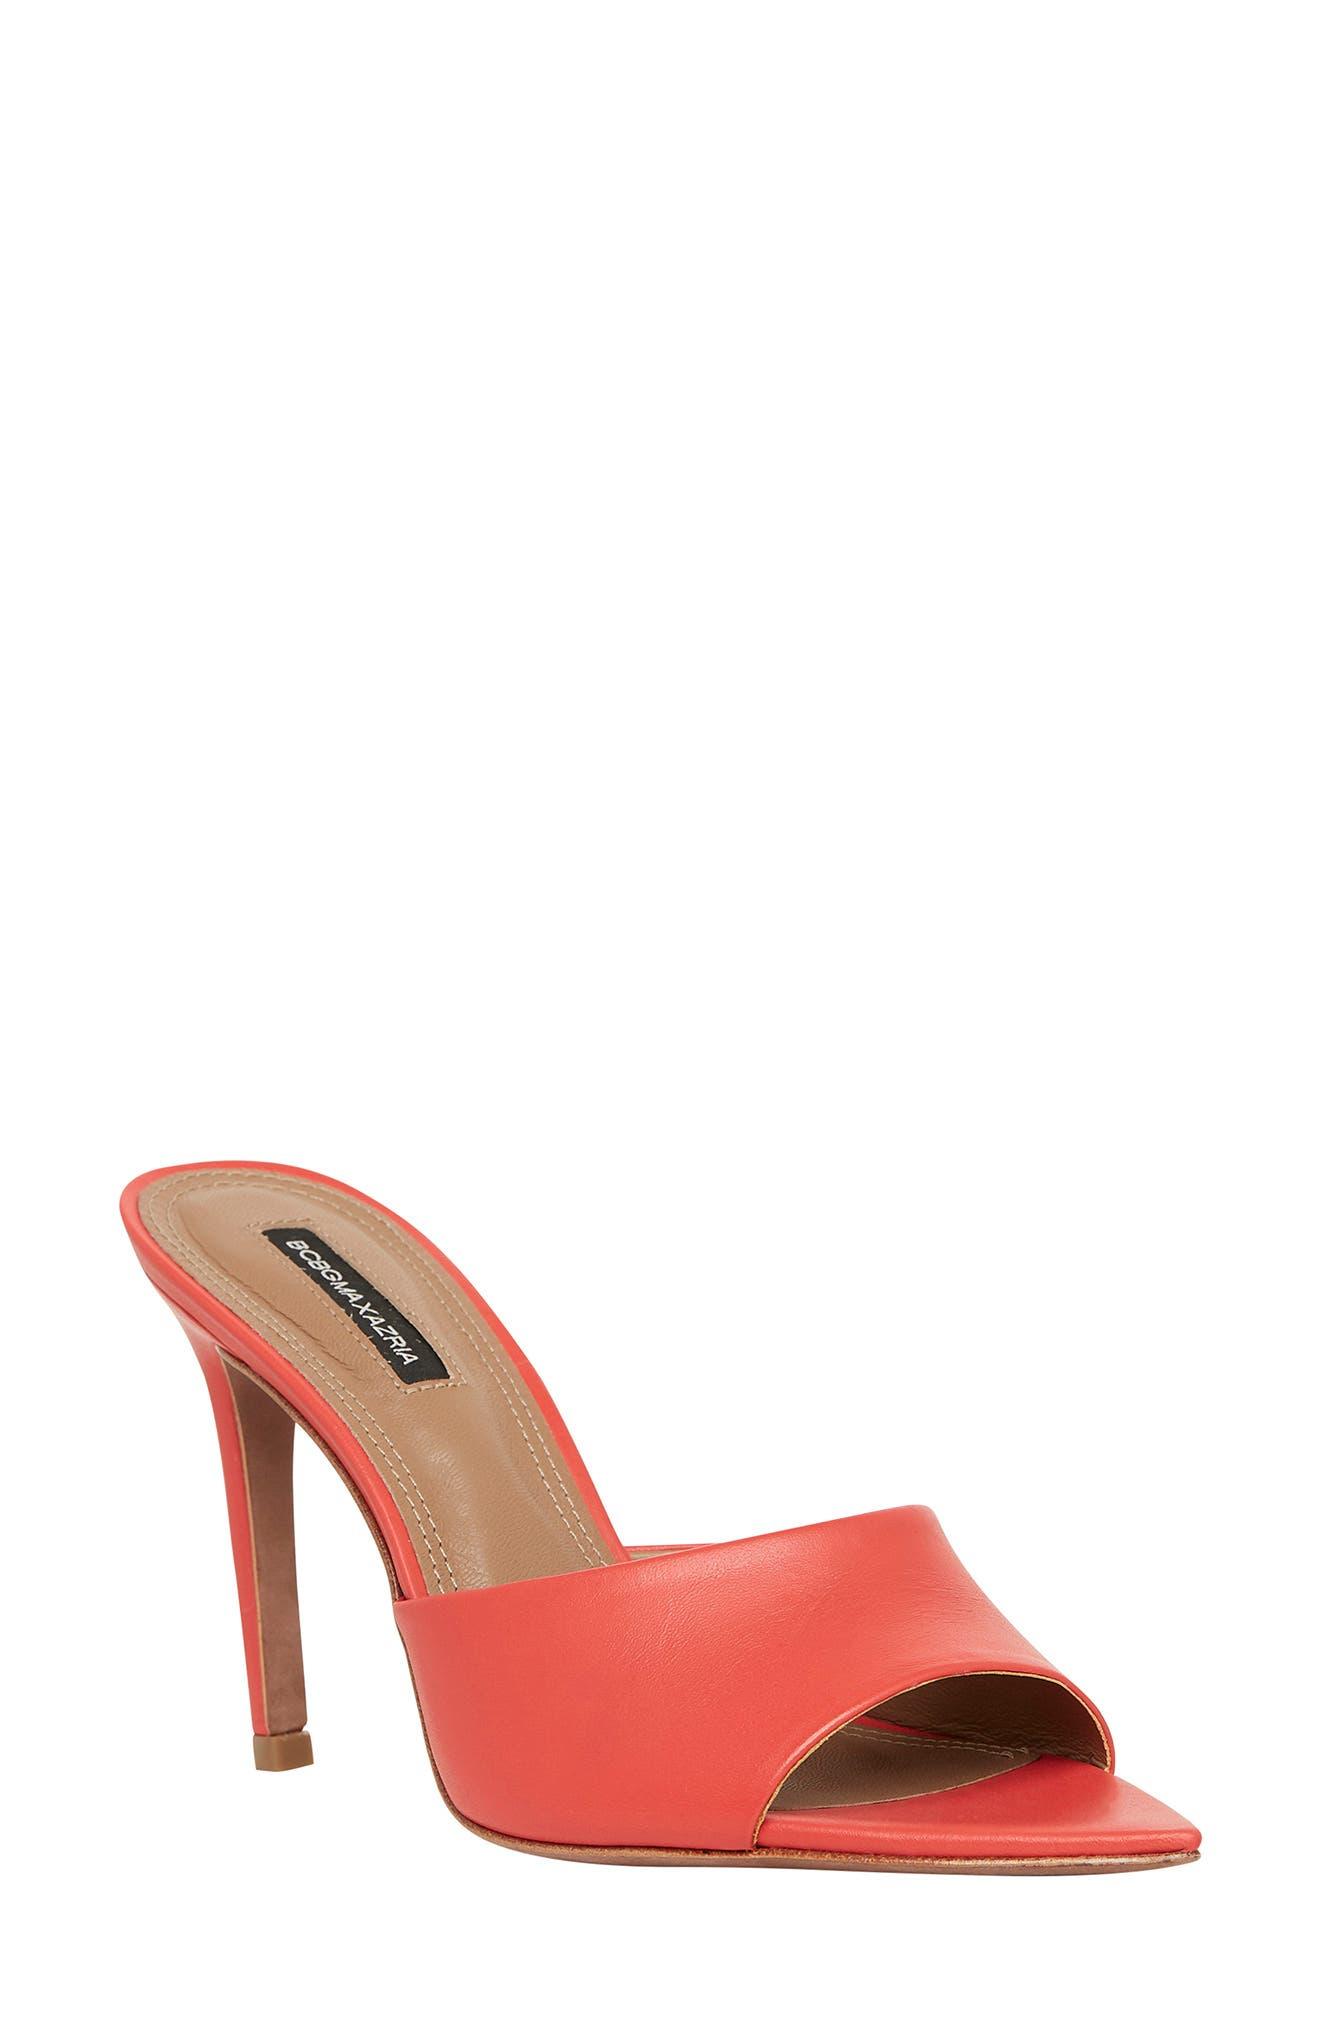 Red Slides Wedges SALE High Heeled Sandals Red and BeigeTan Sandals